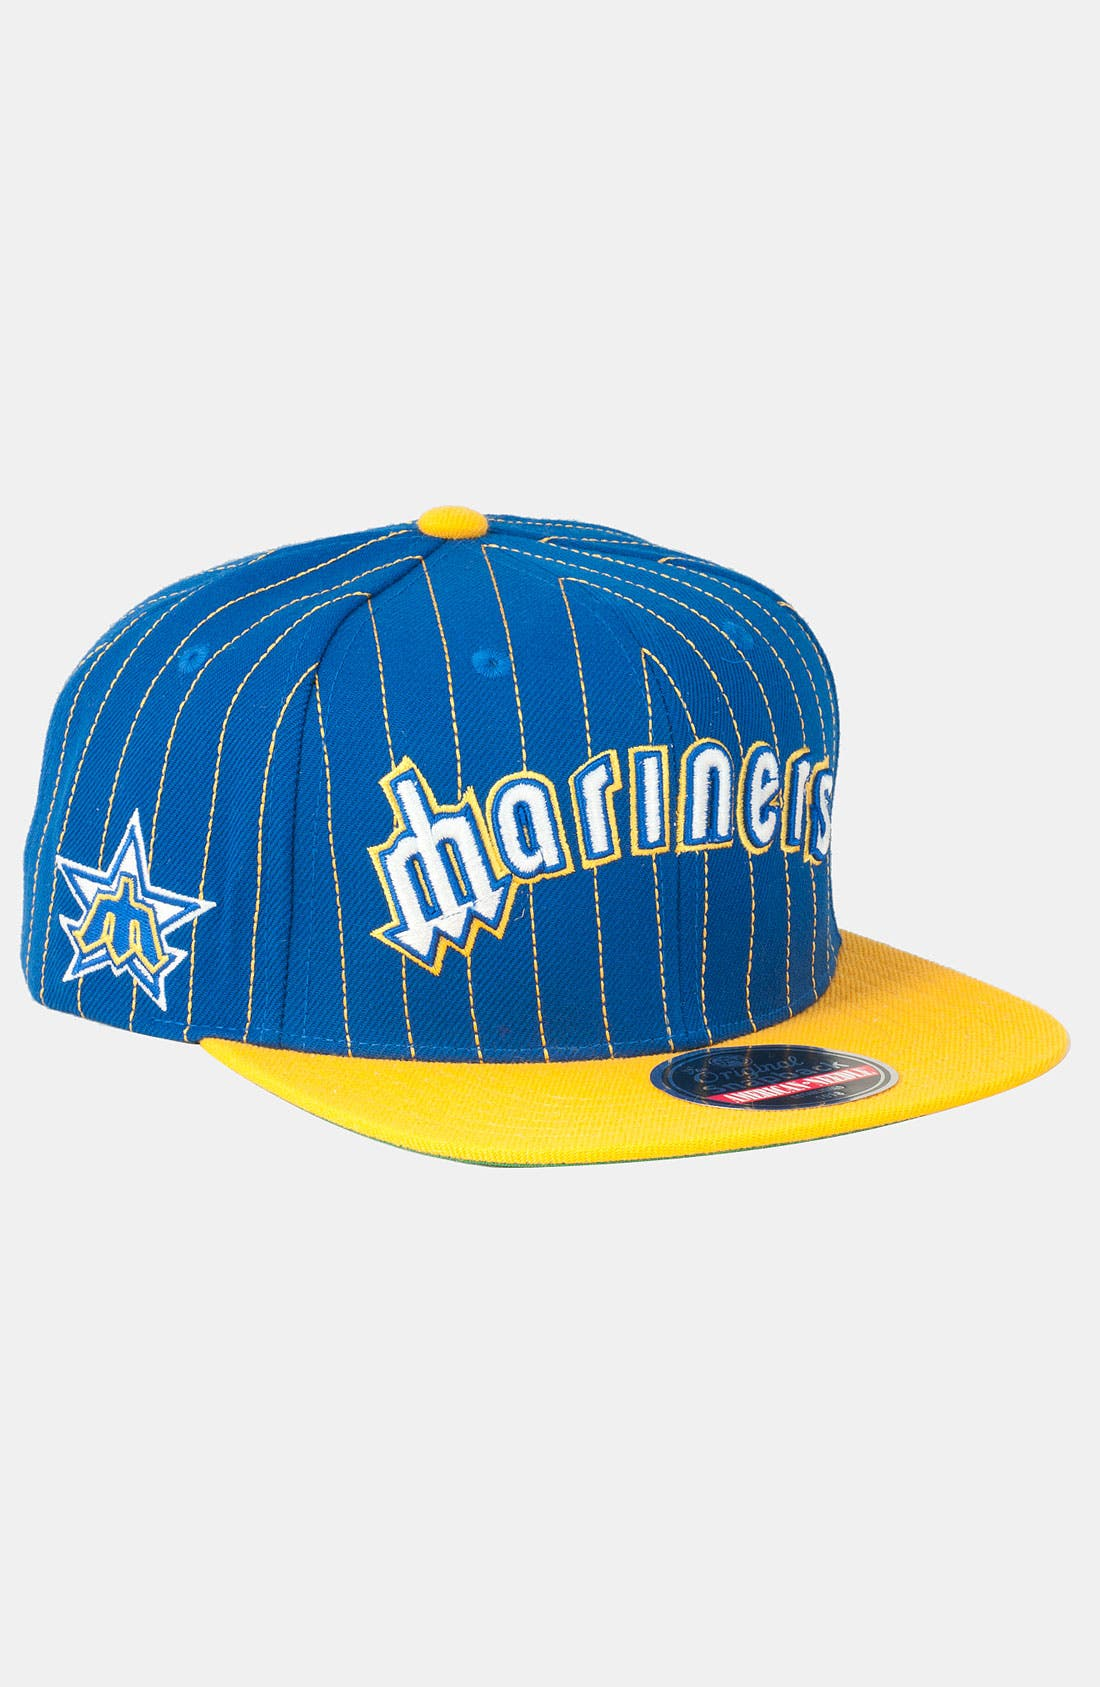 Main Image - American Needle 'Mariners' Snapback Baseball Cap